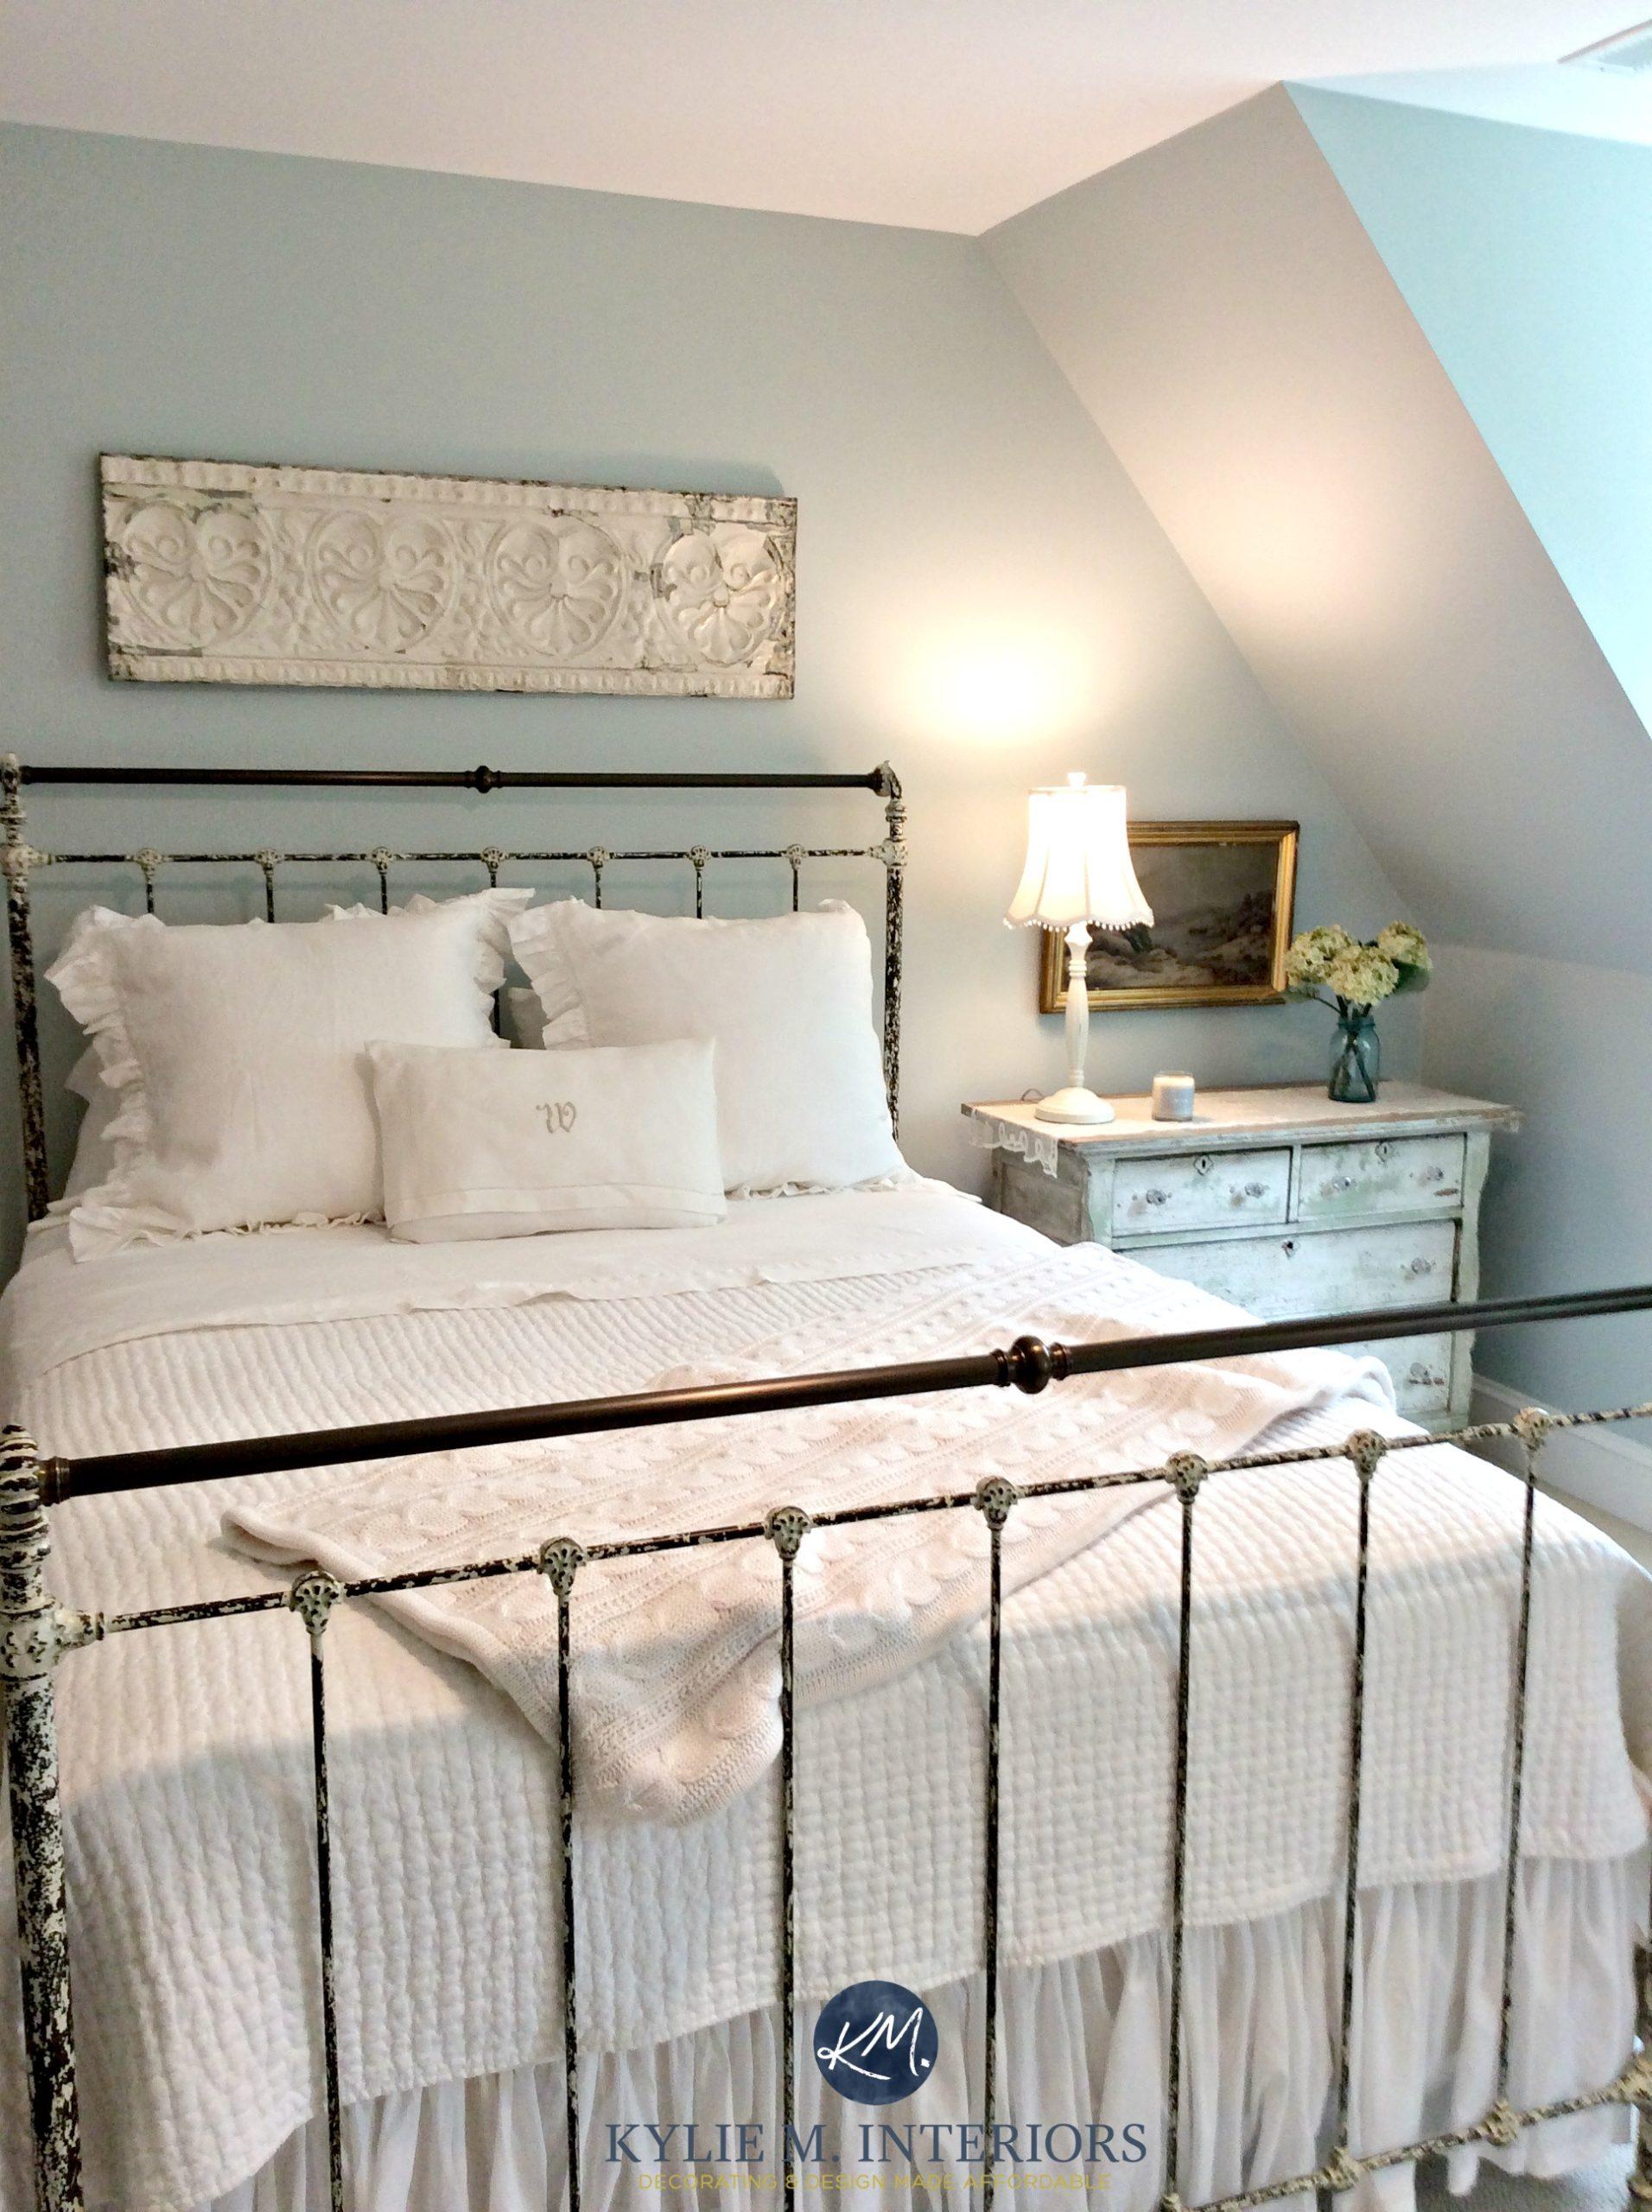 Bon Benjamin Moore Woodlawn Blue, Best Blue Paint Colour. Guest Bedroom.  Antique Furniture. Kylie M Interiors E Decor, Design And ONline Colour  Consulting ...